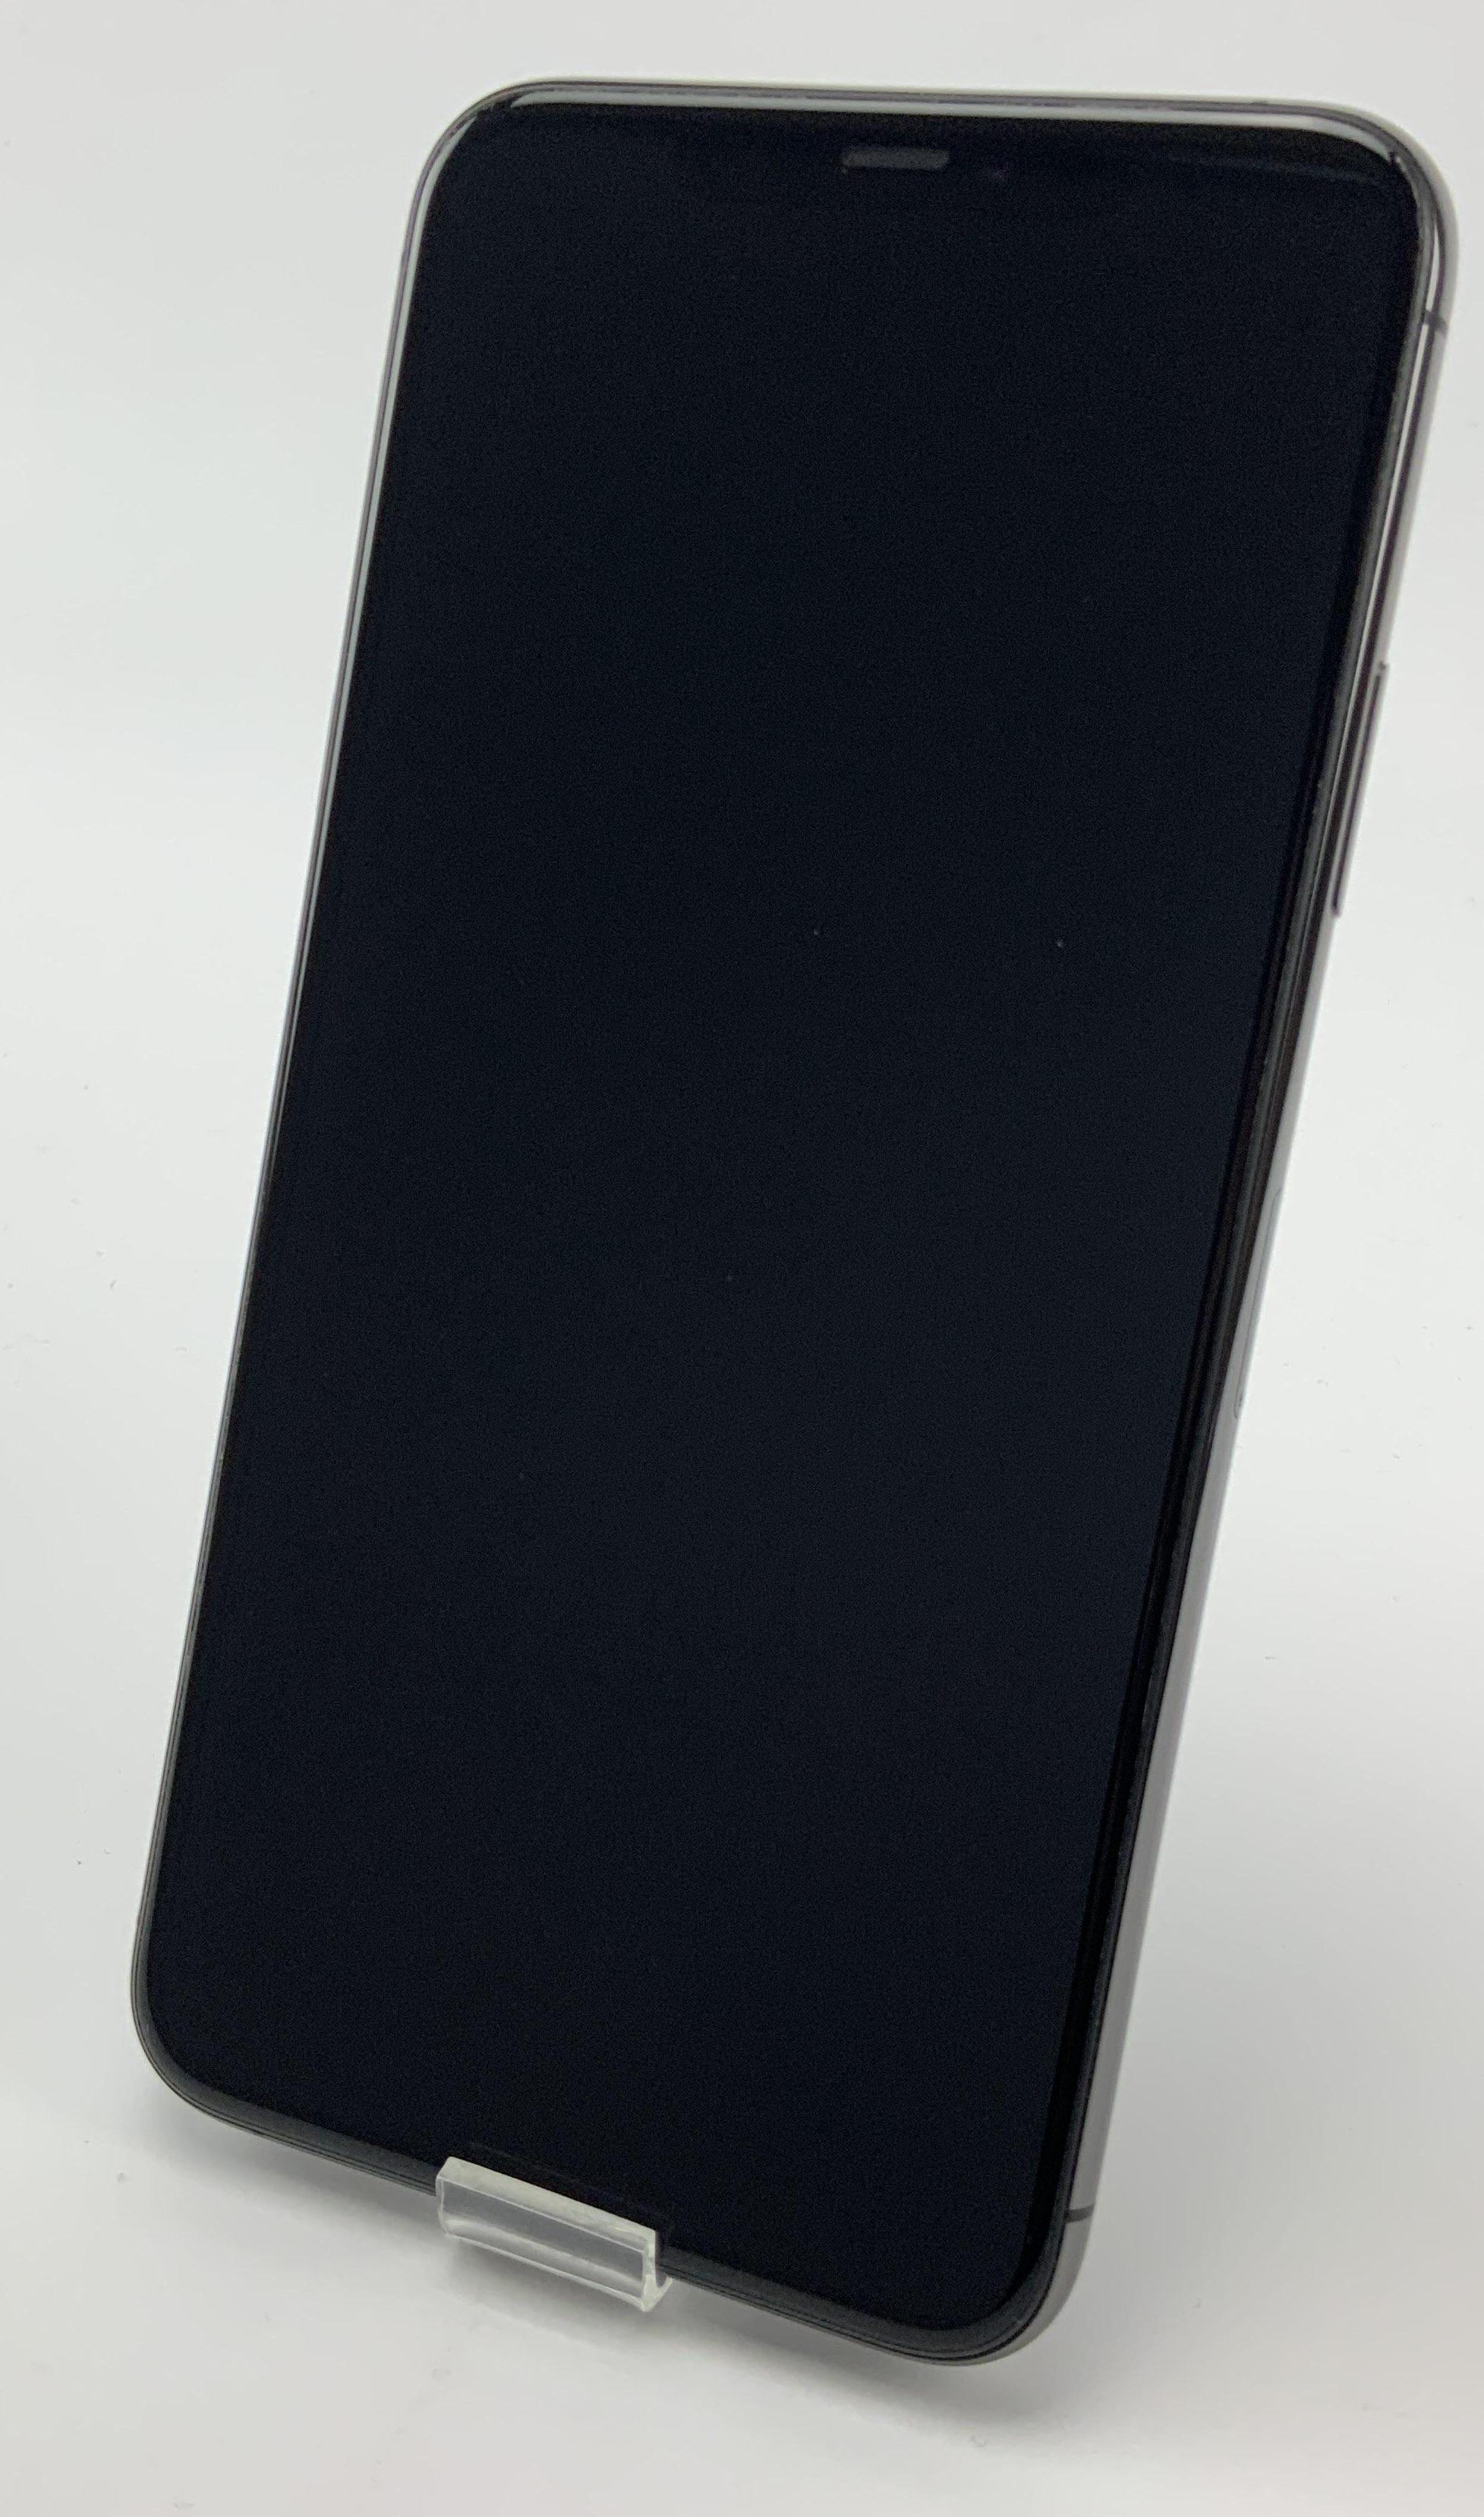 iPhone 11 Pro Max 256GB, 256GB, Space Gray, imagen 1